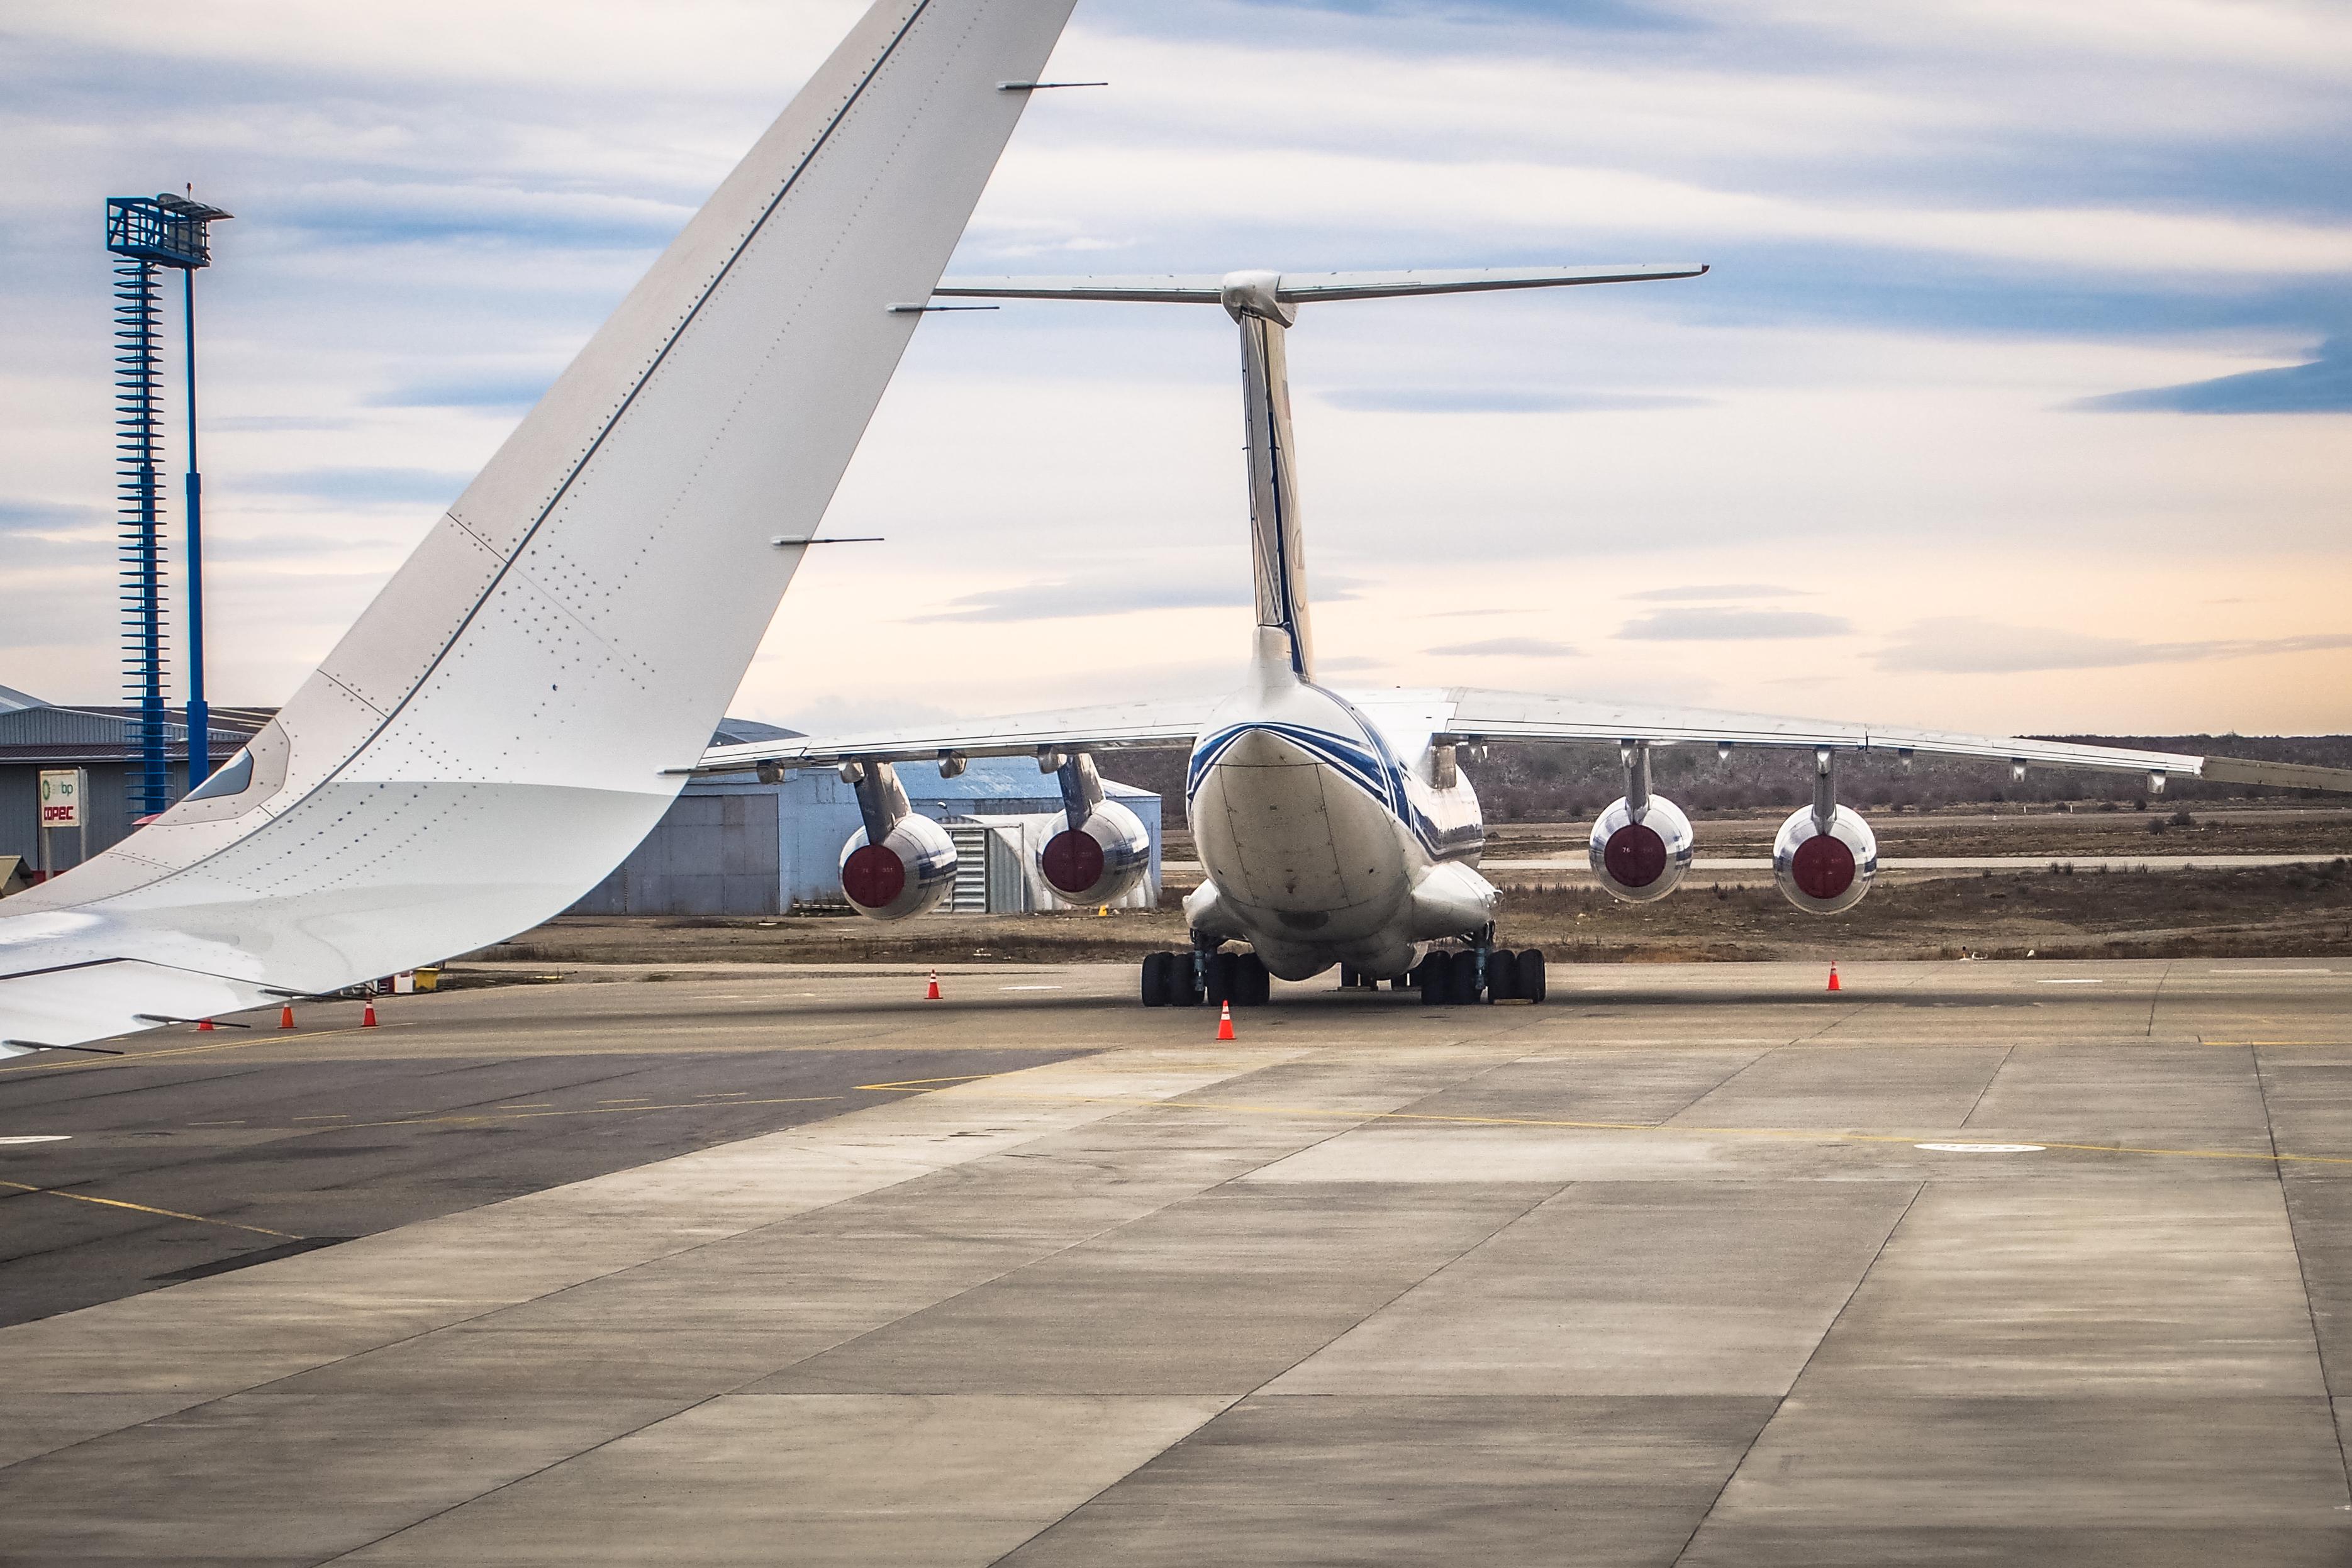 Airplane near the terminal in an airport photo